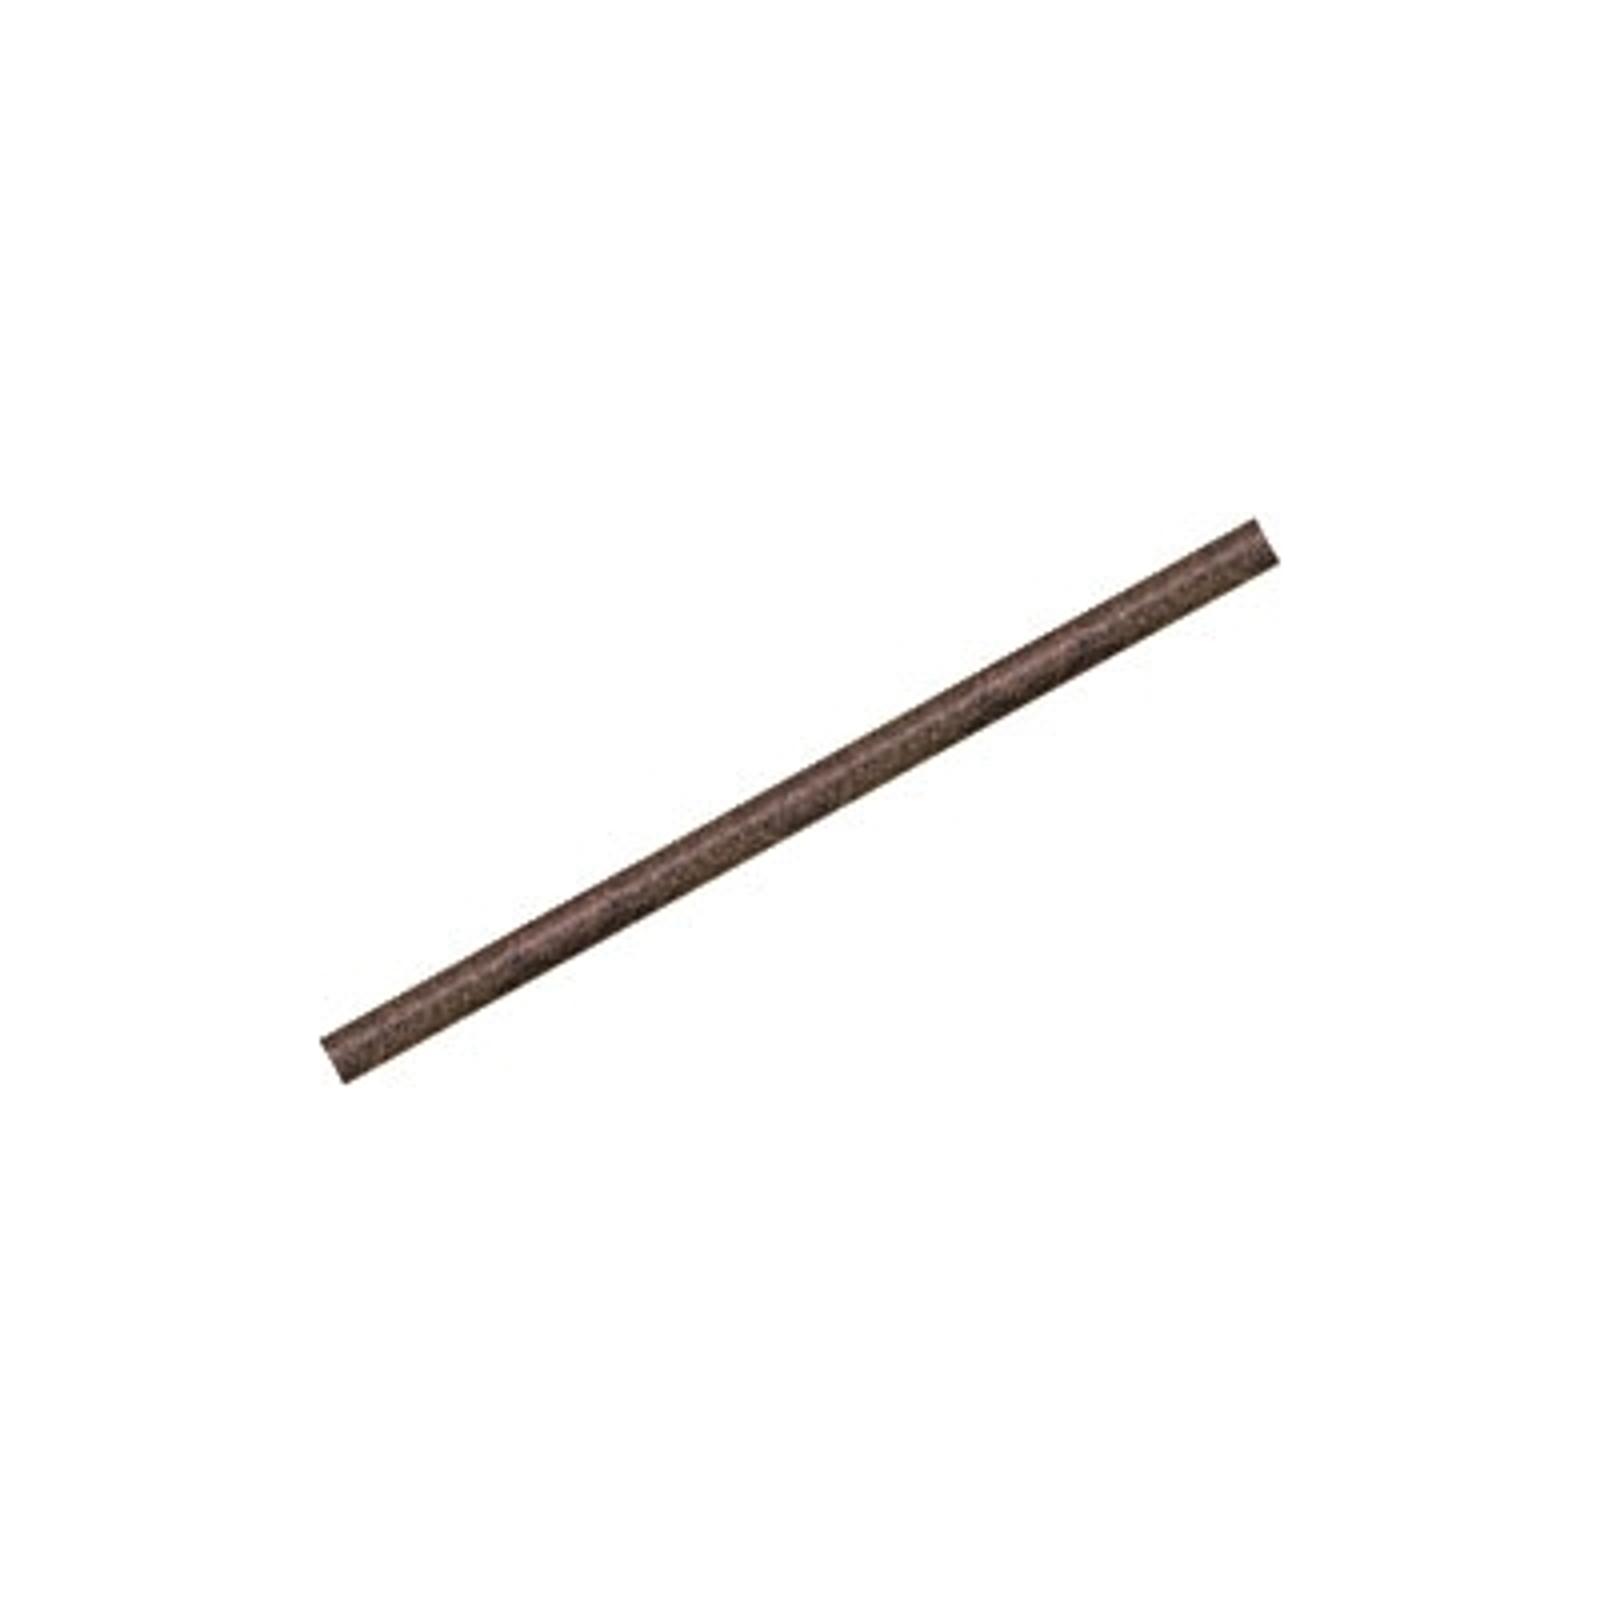 Extension rod antique brown_2015046_1